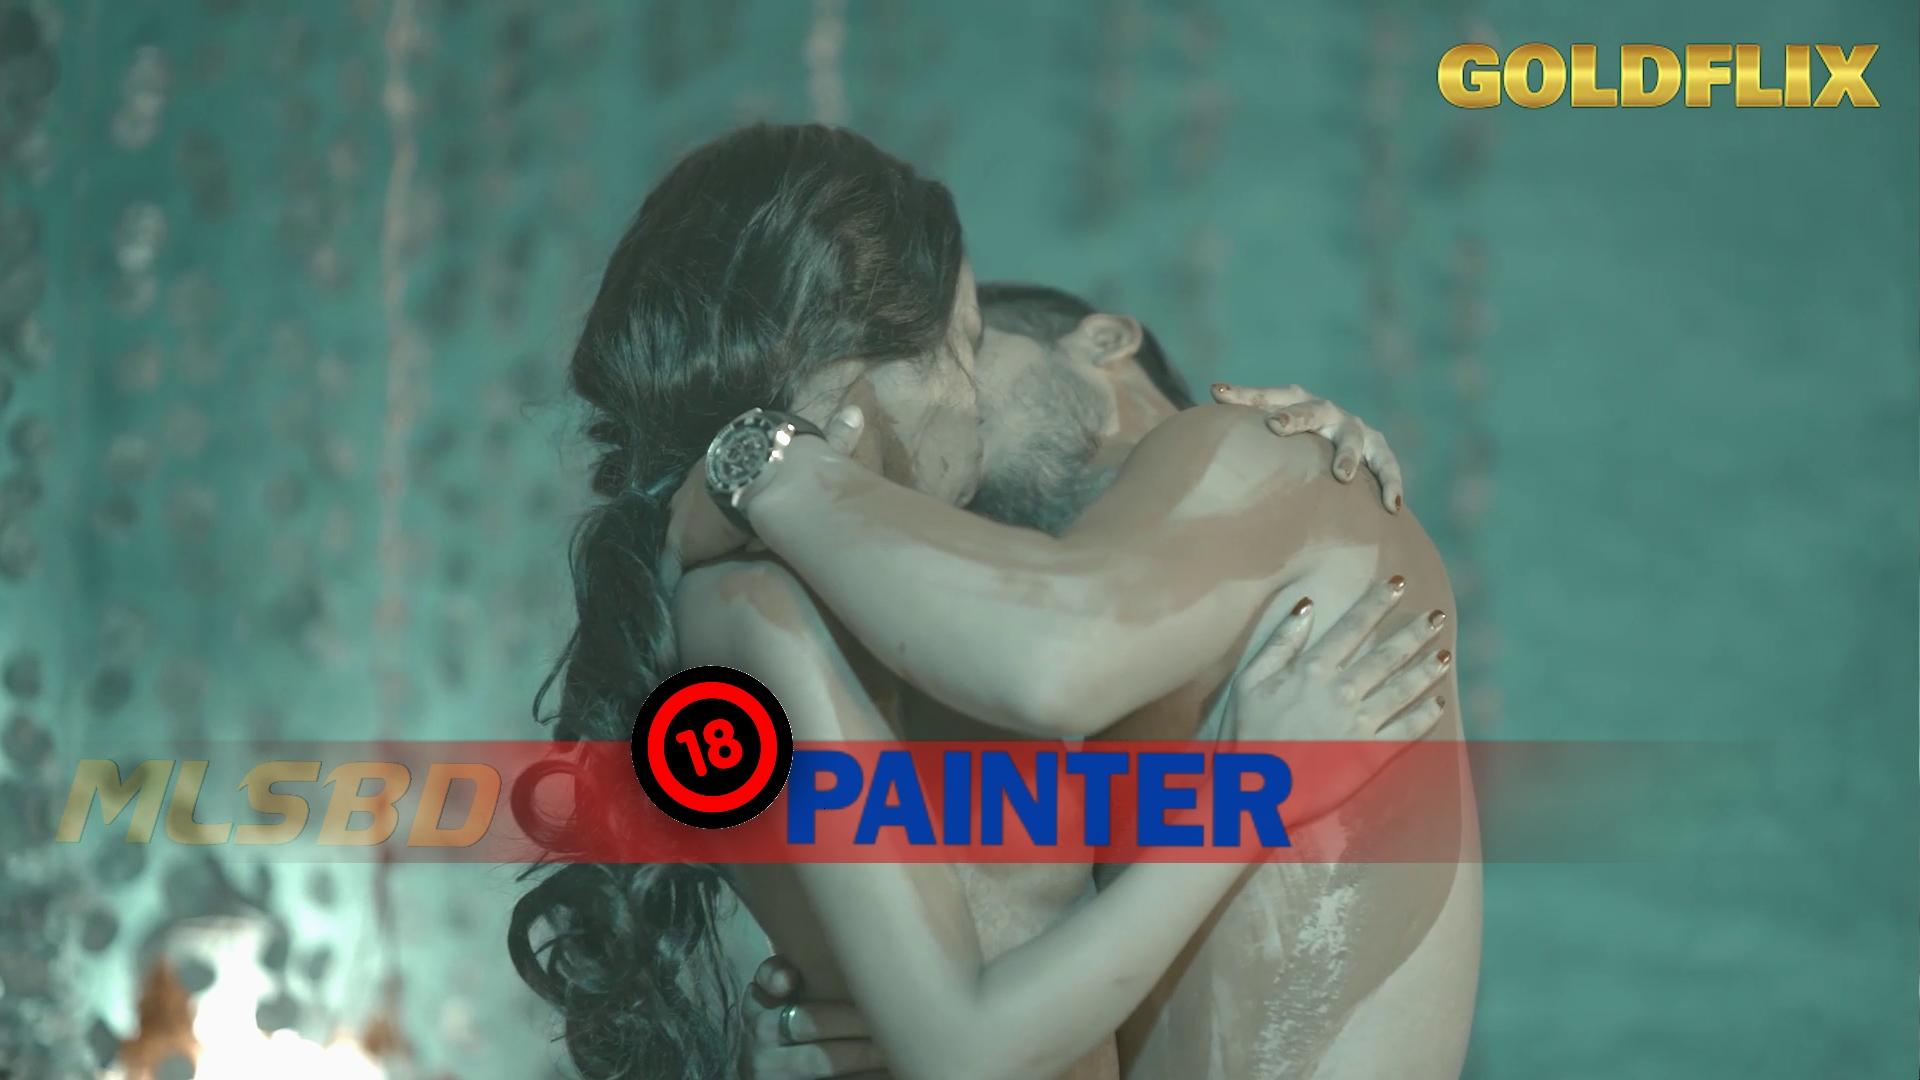 (18+)Painter (2021) Hindi Part 1 UnCensored WEB-DL  720P  x264 250MB  Download